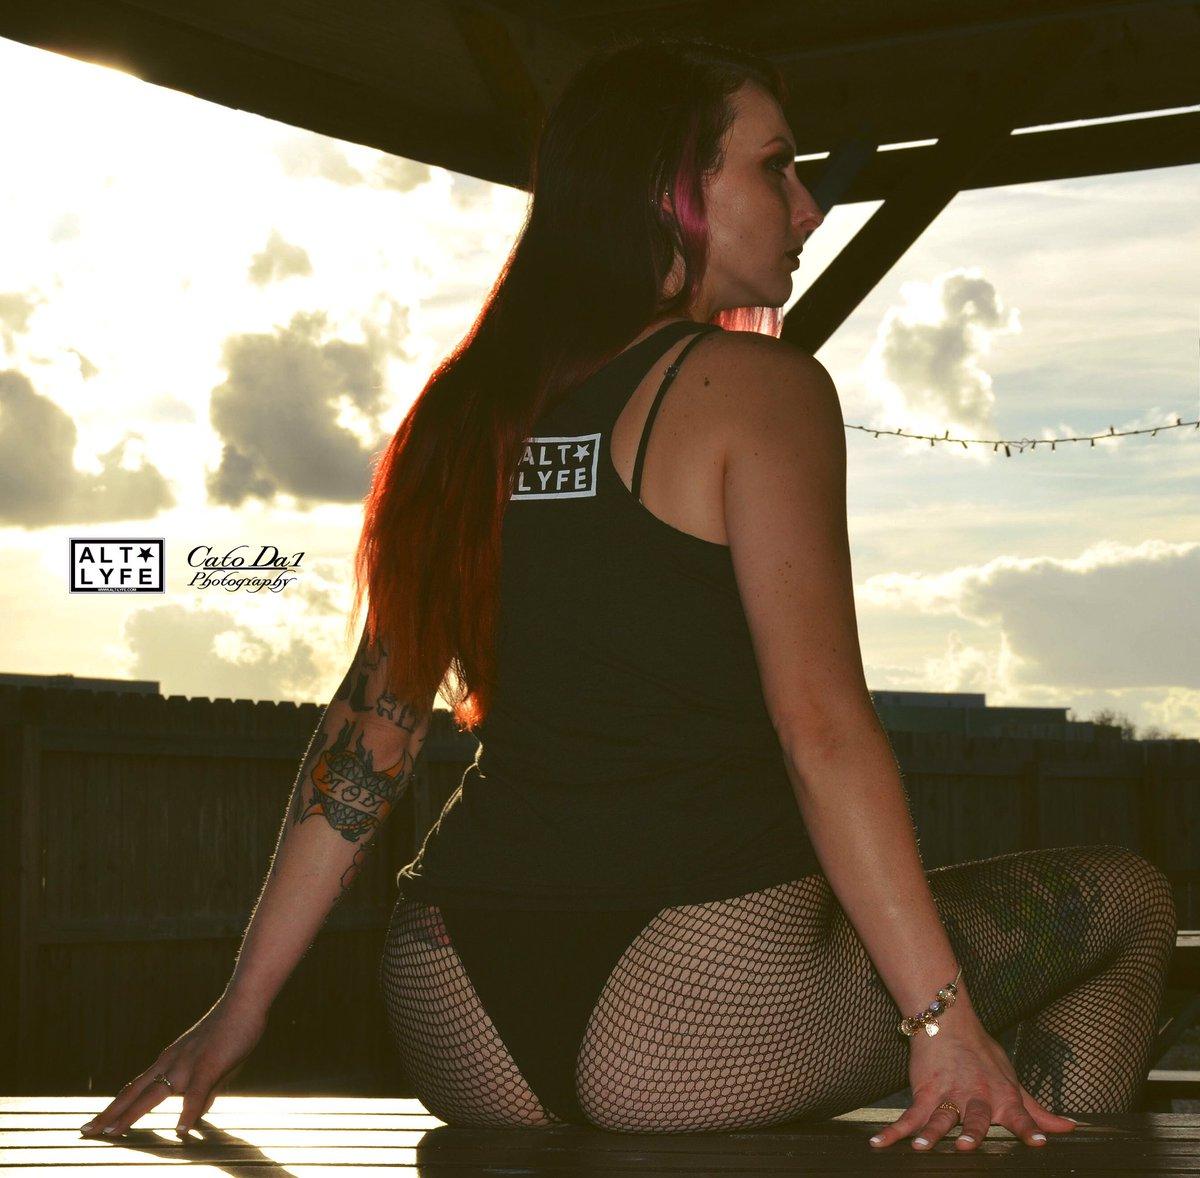 🍑 Happy Hump Day! 🤟🏾 Tank Top: @ALT_LYFE  * 🎞 CatoDa1Photography  Published Model ⚔️: @kellythedestroyer  Ethnic: 🇮🇪 Irish 📸:@catoda1  Photo©️ #alt #lyfe #sky #clouds #vibrant #tattoogirl #curves4days #humpday #appreciationpost #cakedecorator #irish